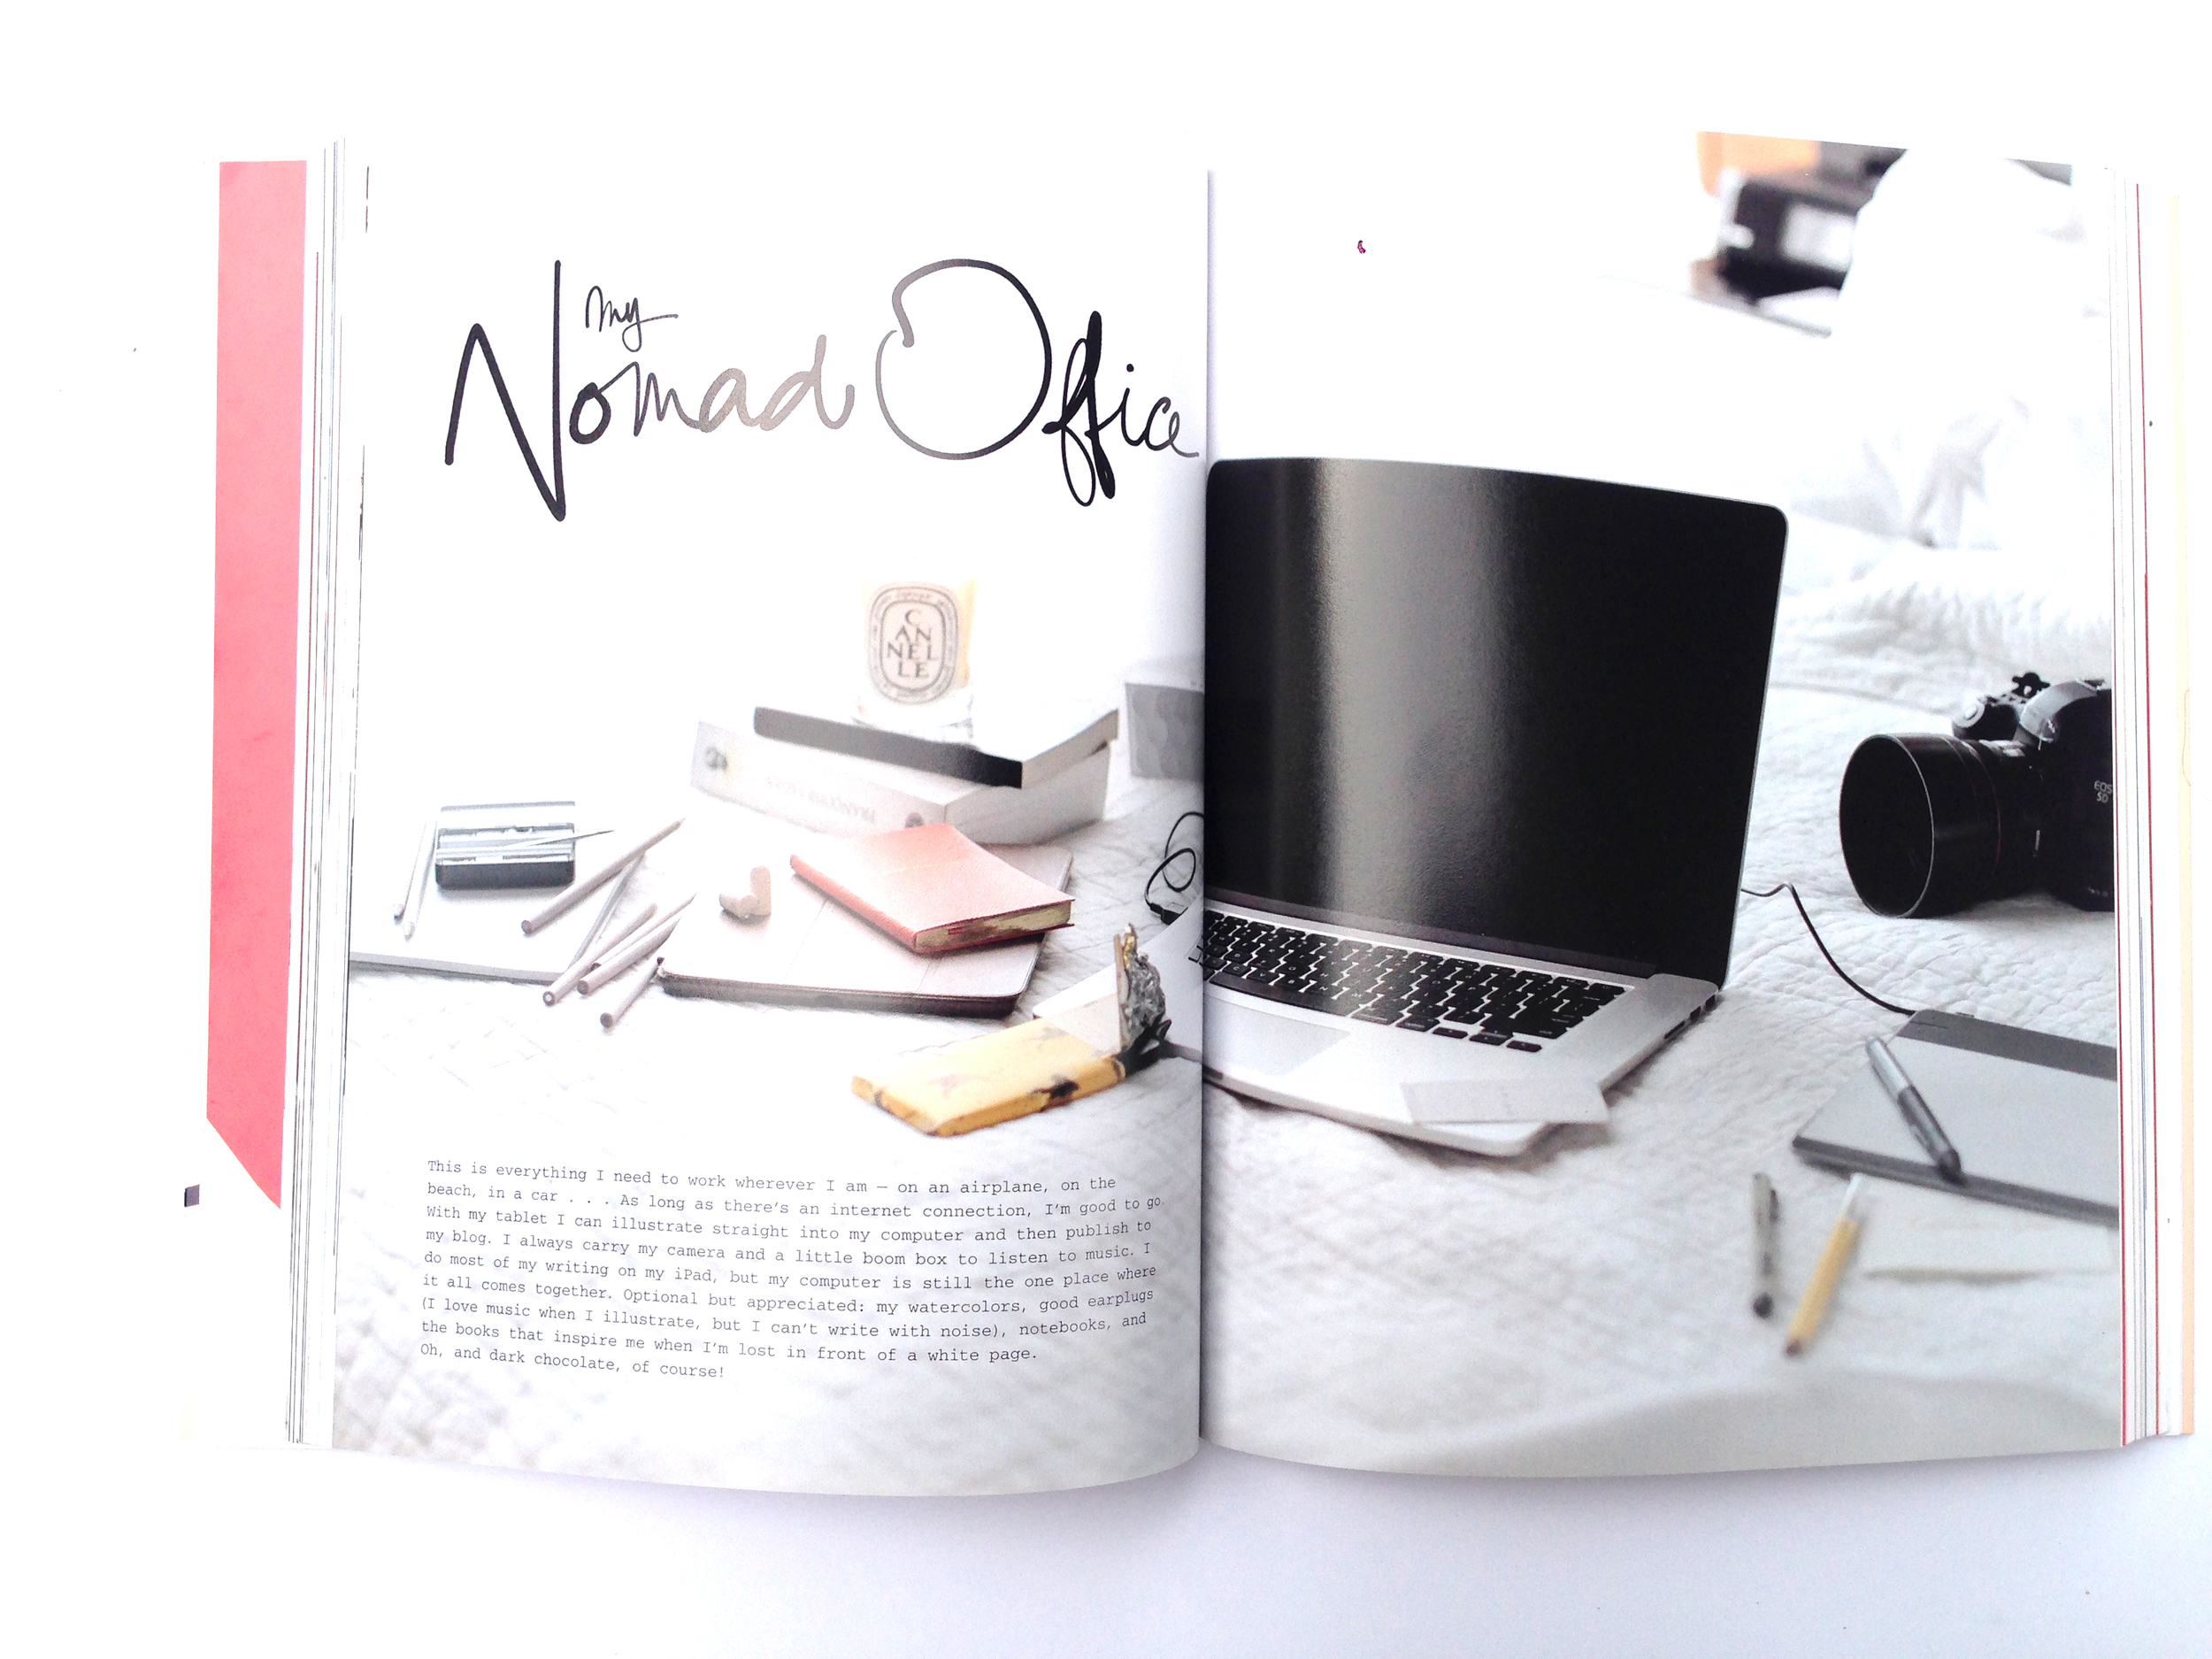 Andrea-Fenise-Garance-Dore-Book-Review